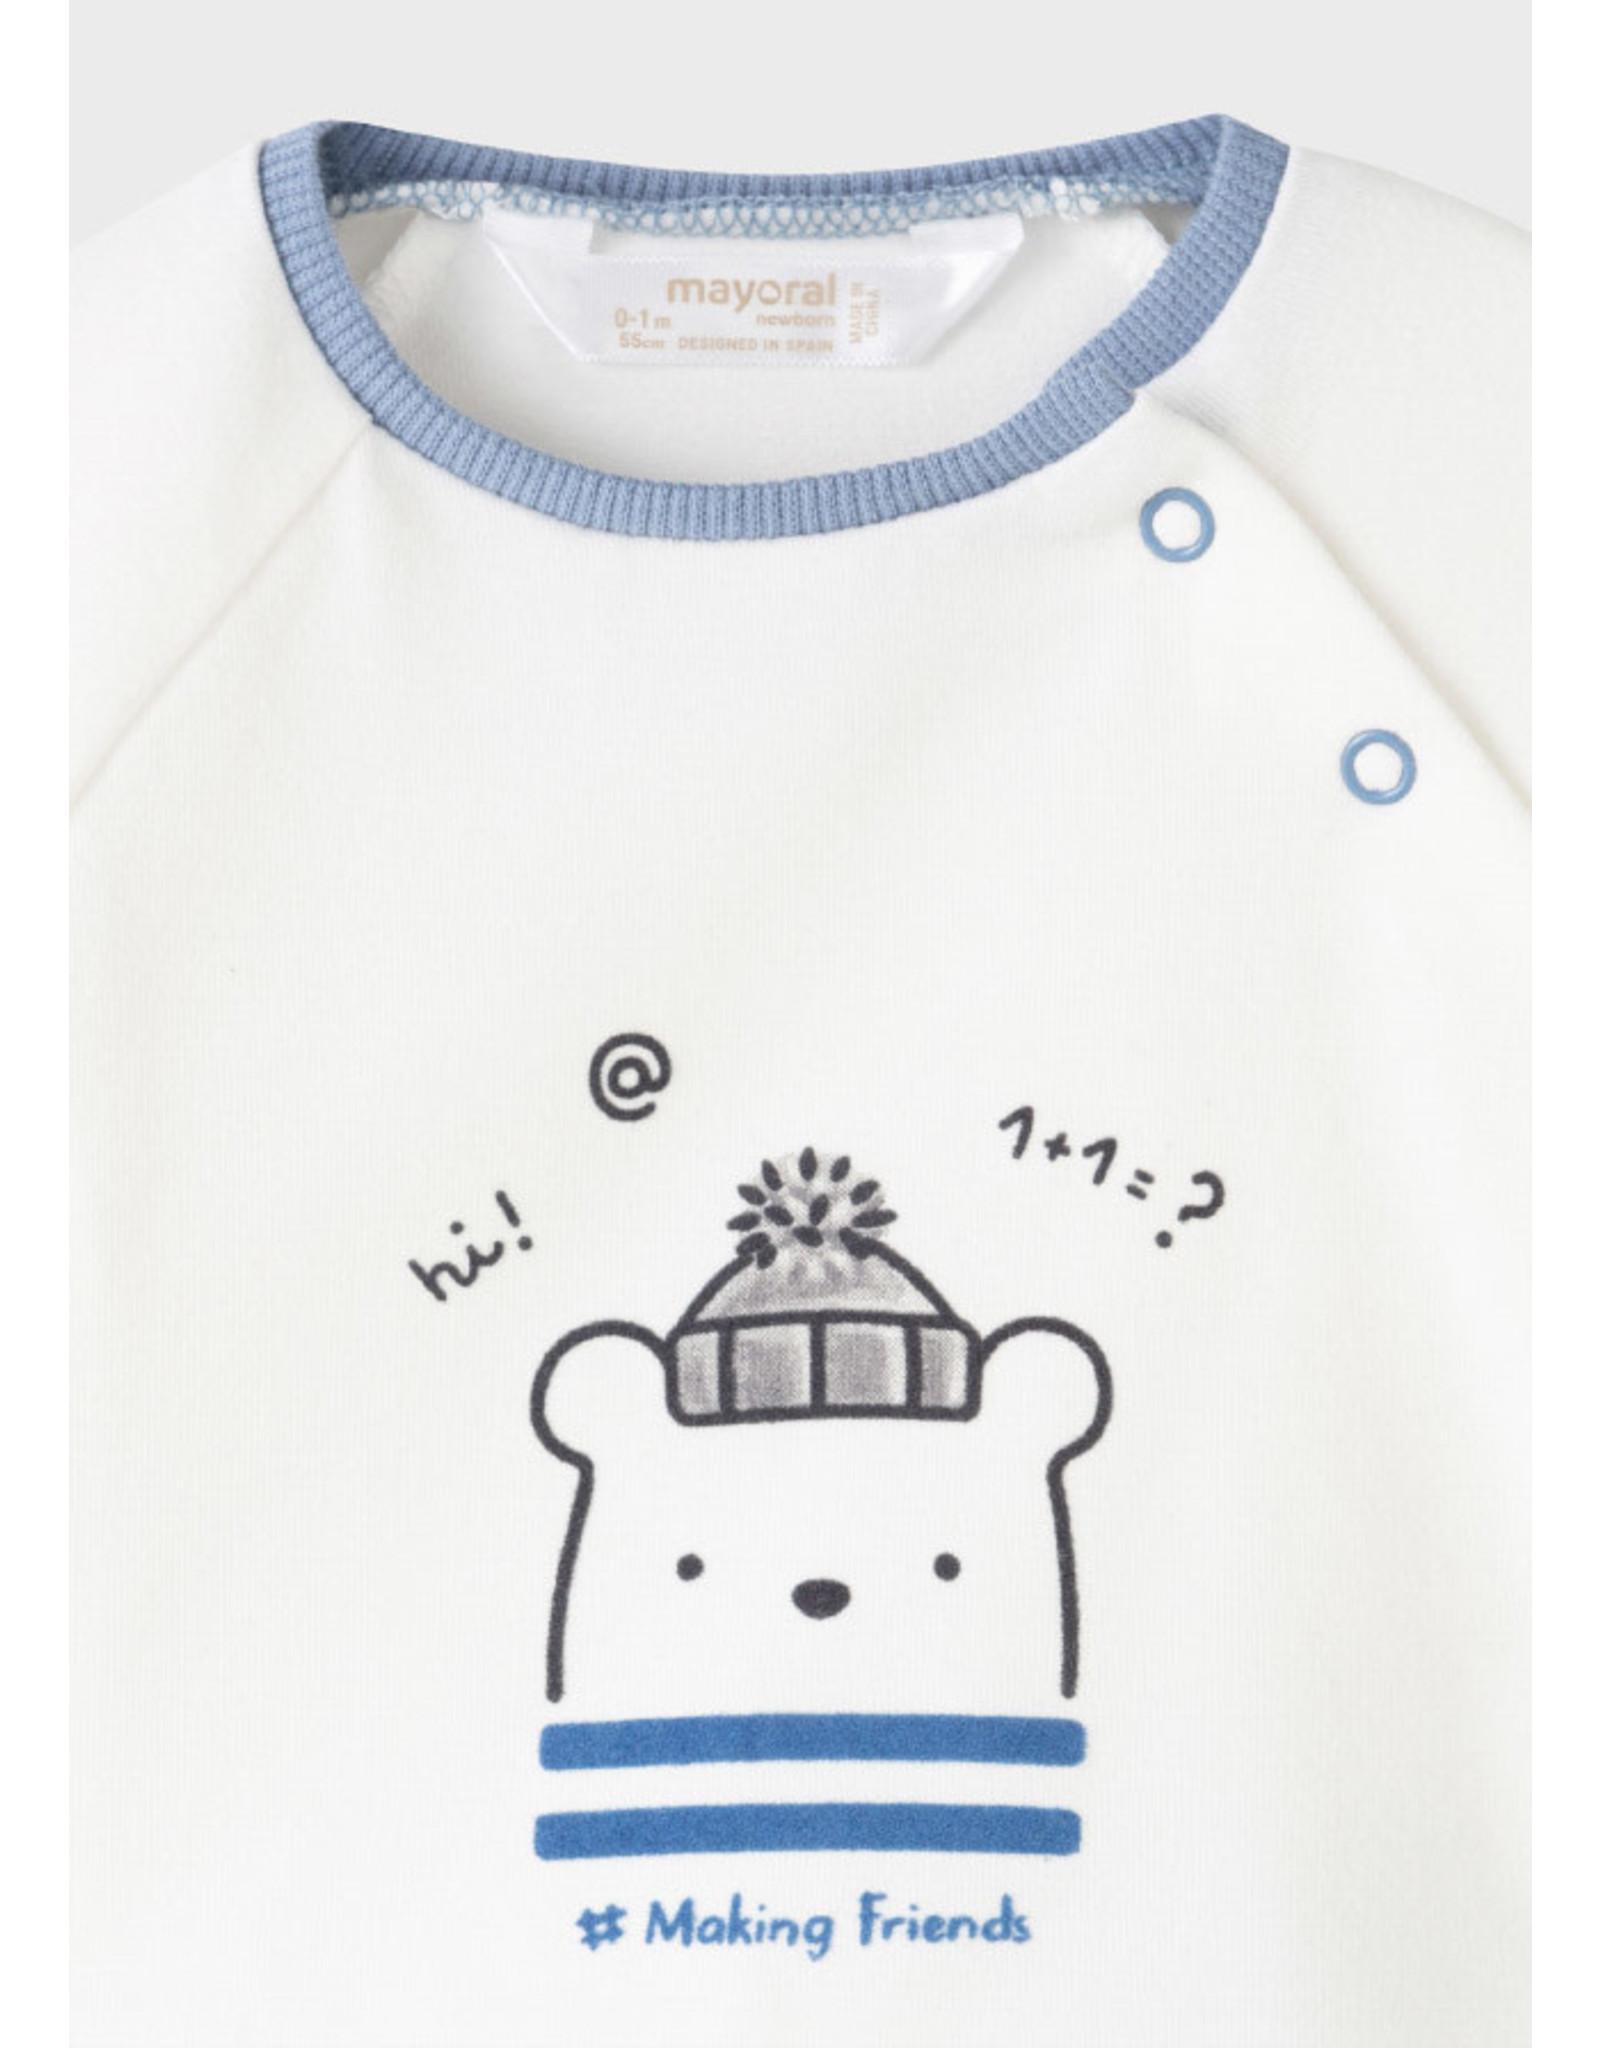 Mayoral Polar Bear Fleece Tracksuit and Shirt